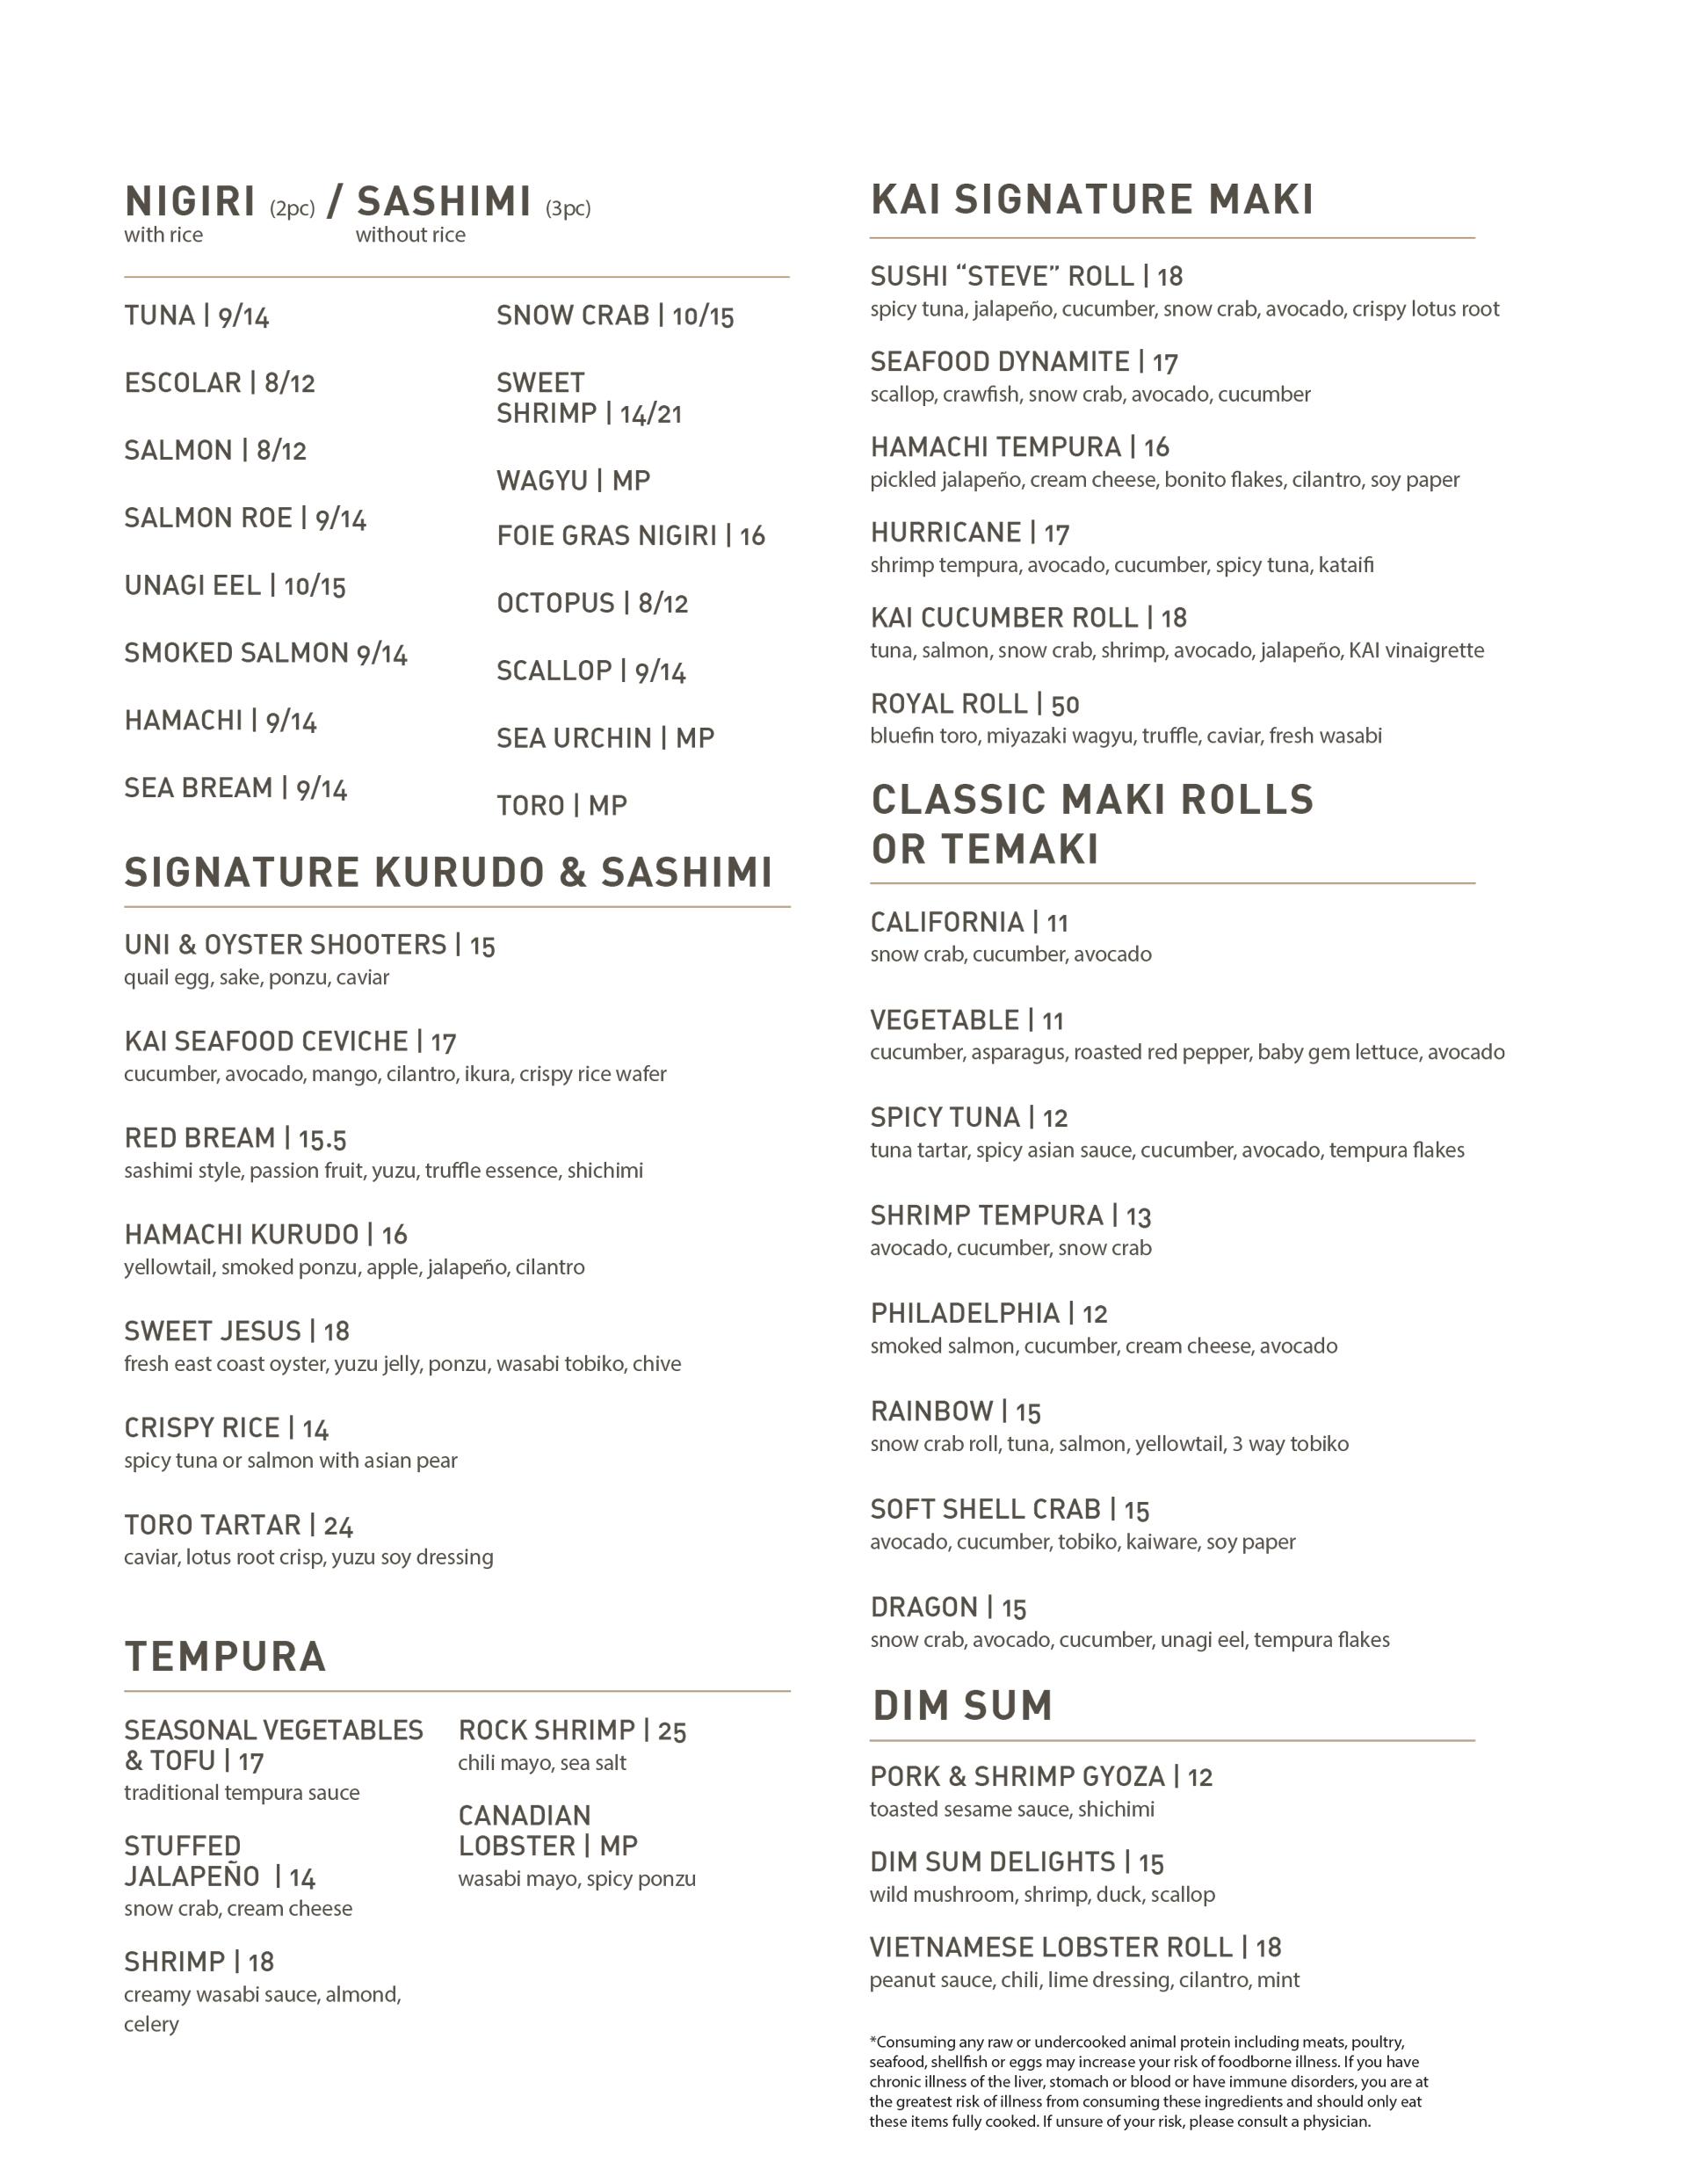 KAI-Dinner-Menu-6.28.19-1.jpg